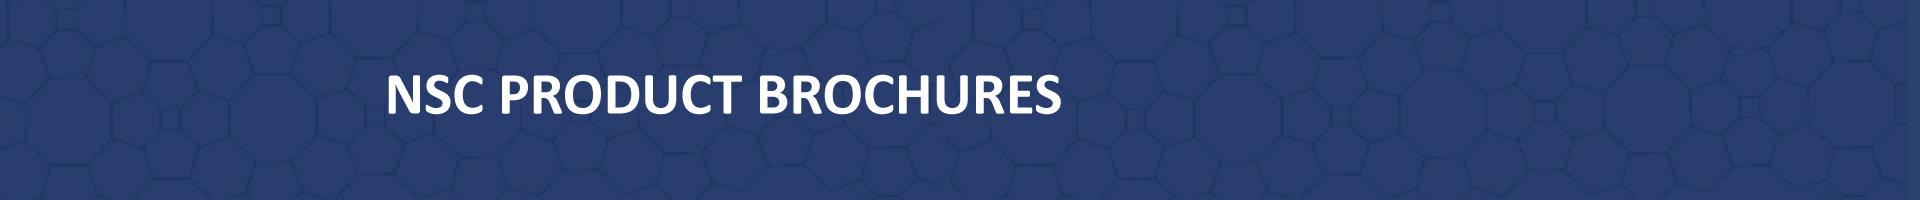 BANNER-NSC-PRODUCT-BROCHURES